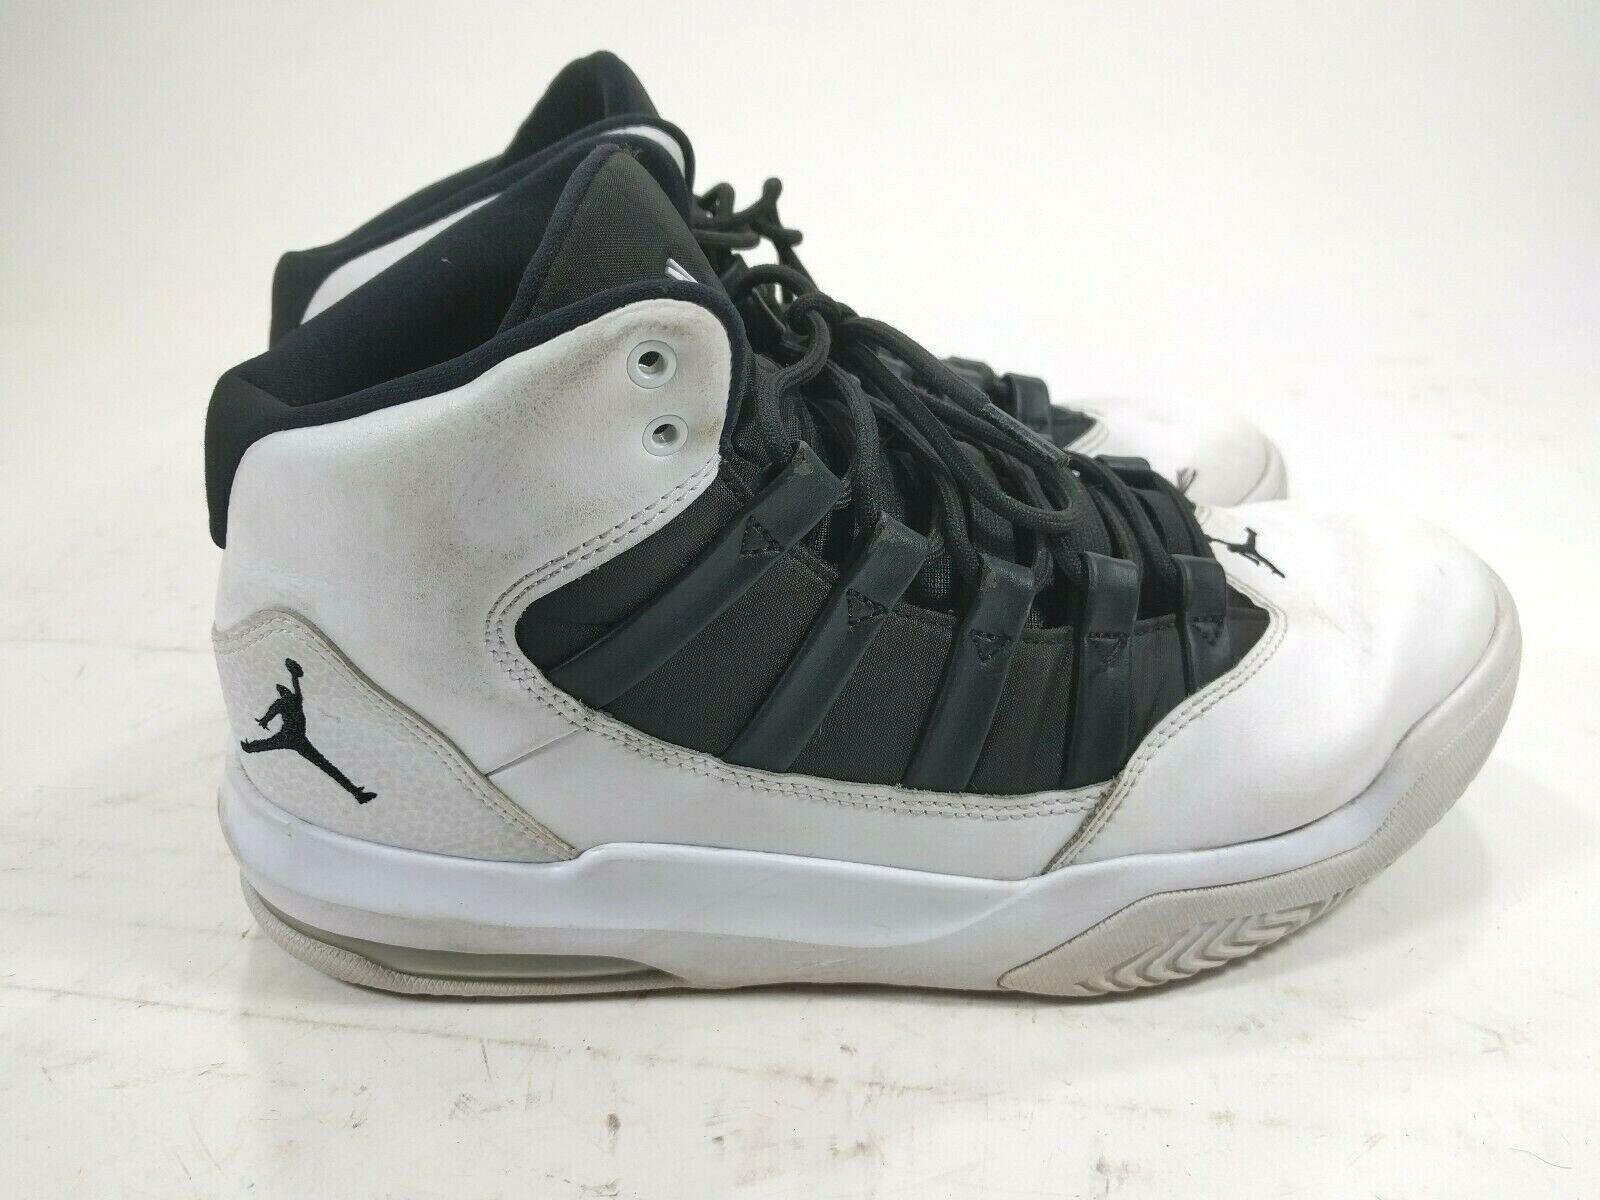 Para hombres zapatos de baloncesto Jordan Max Aura Air blancoo Negro Tamaños 10 AQ9084-100